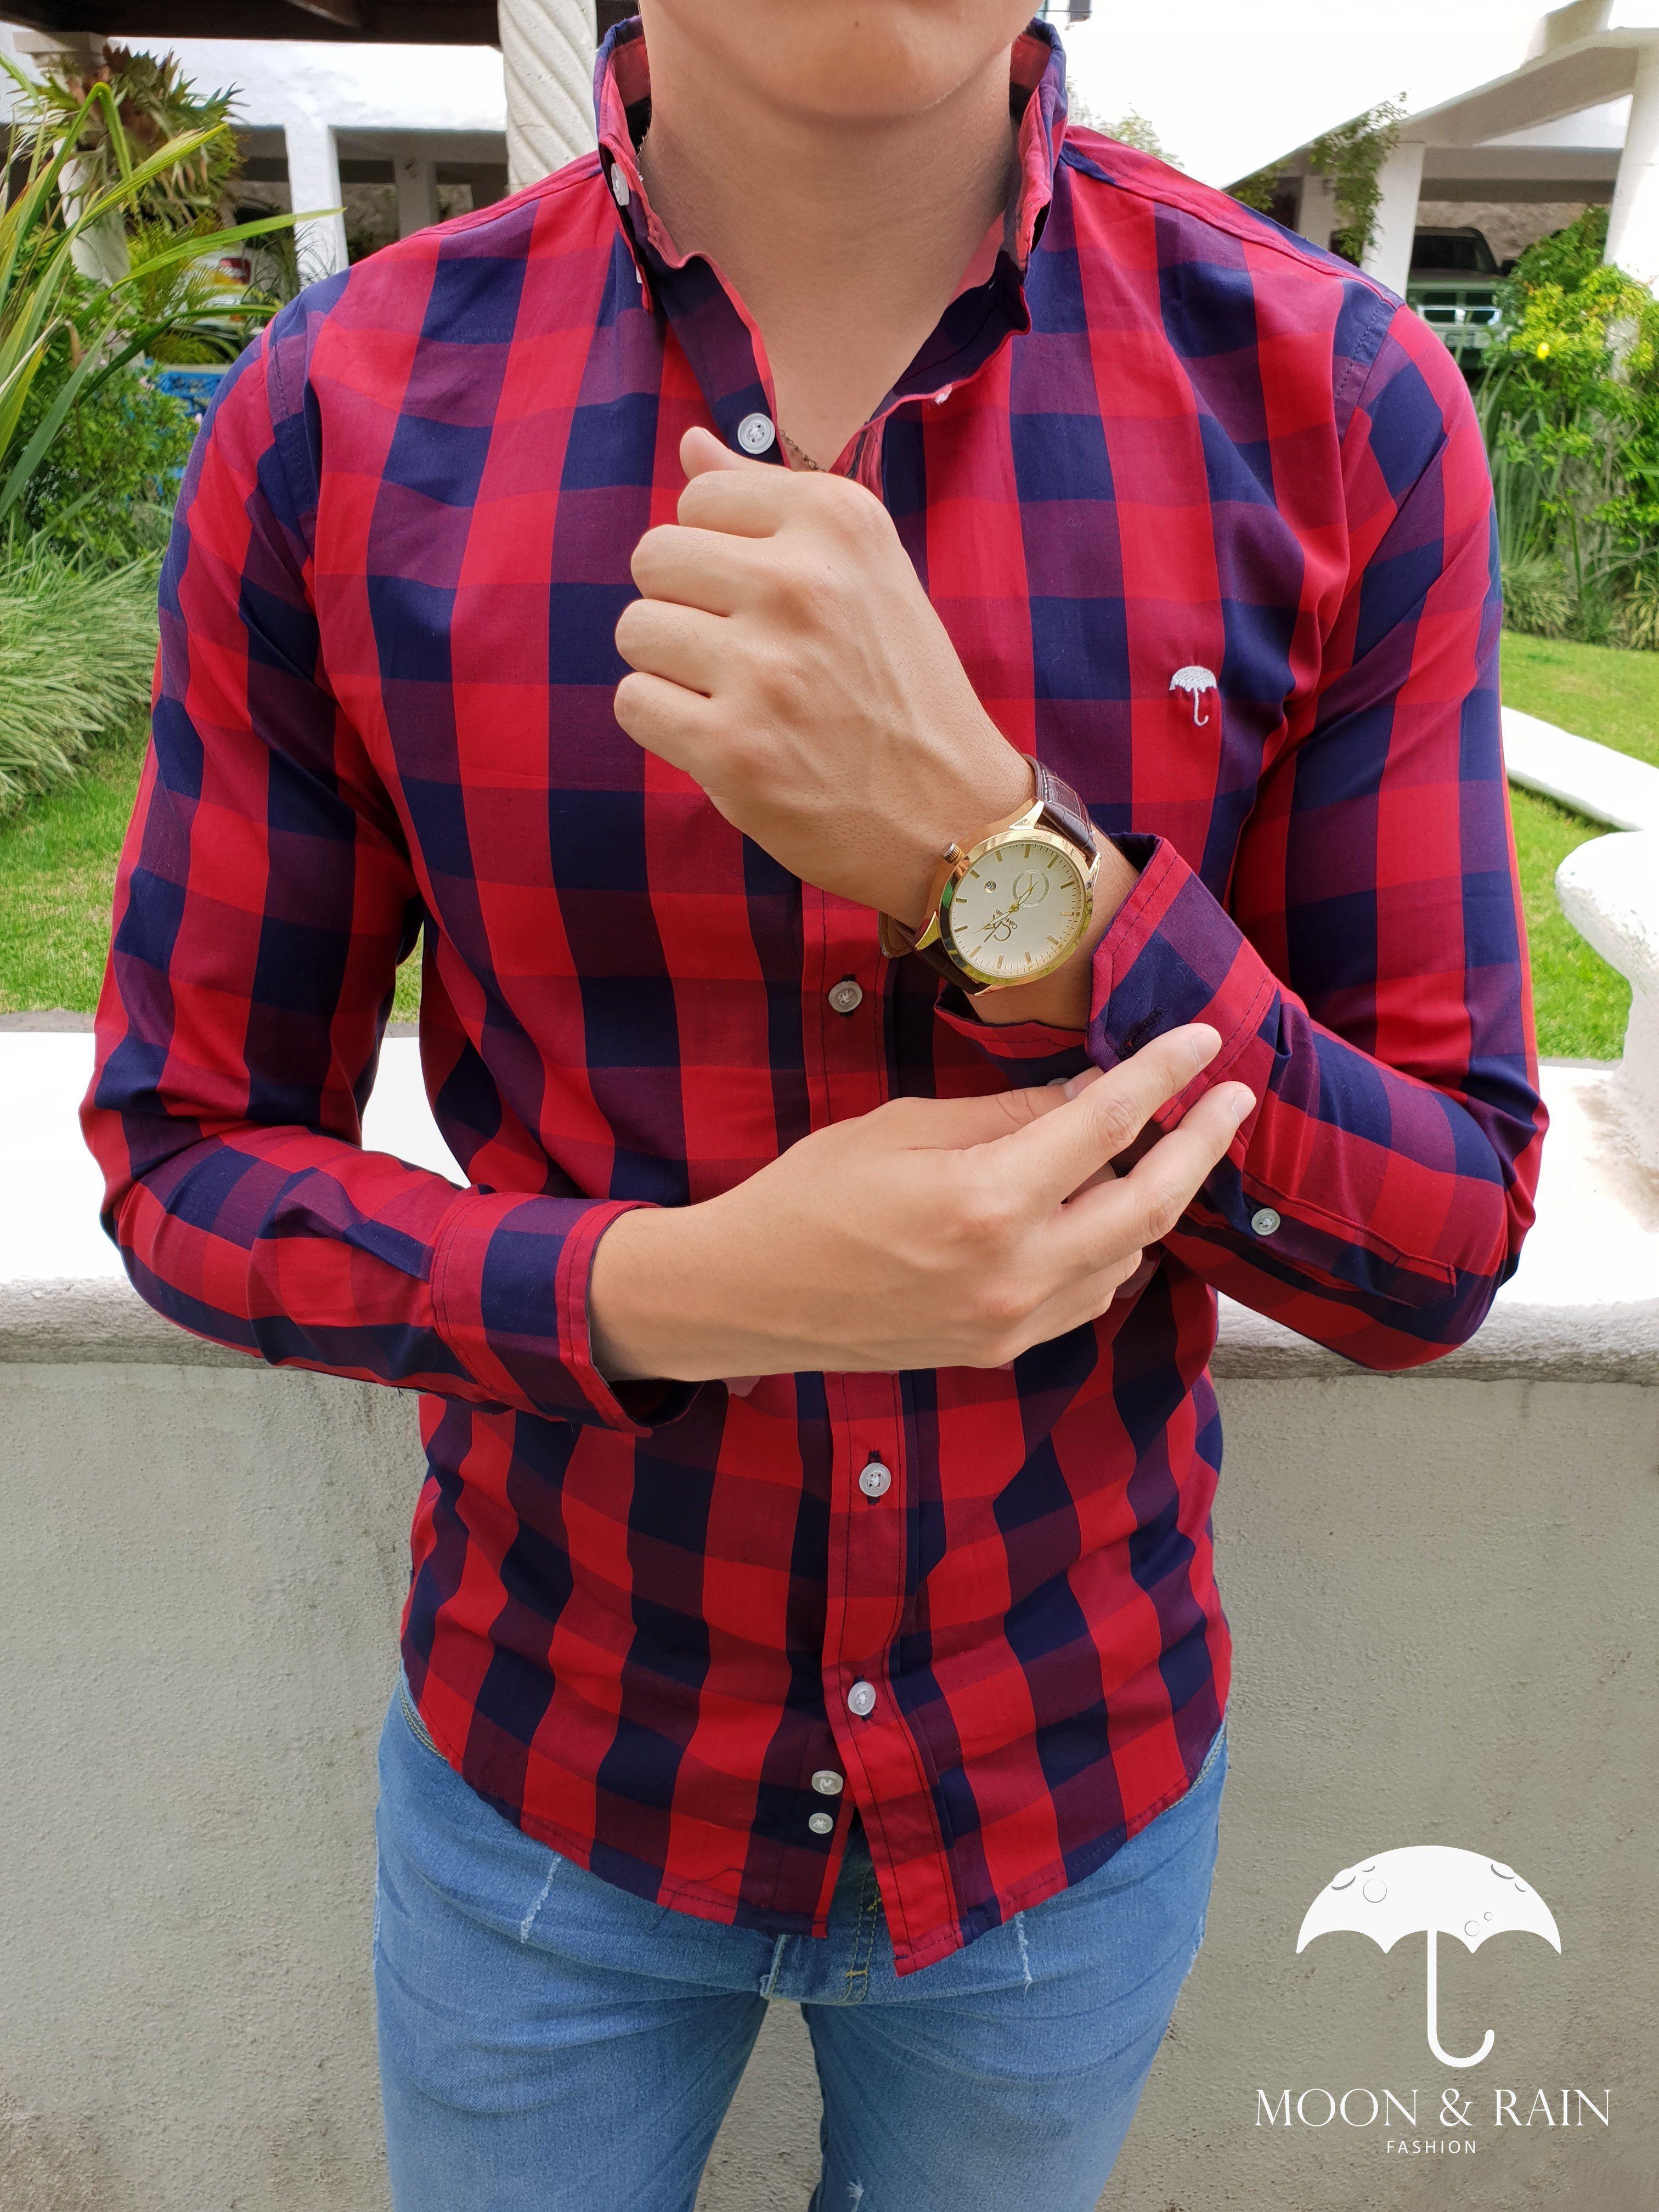 Outfit para hombre  camisa de cuadros marino y rojo en manga larga ... 8d8b5f6863fa